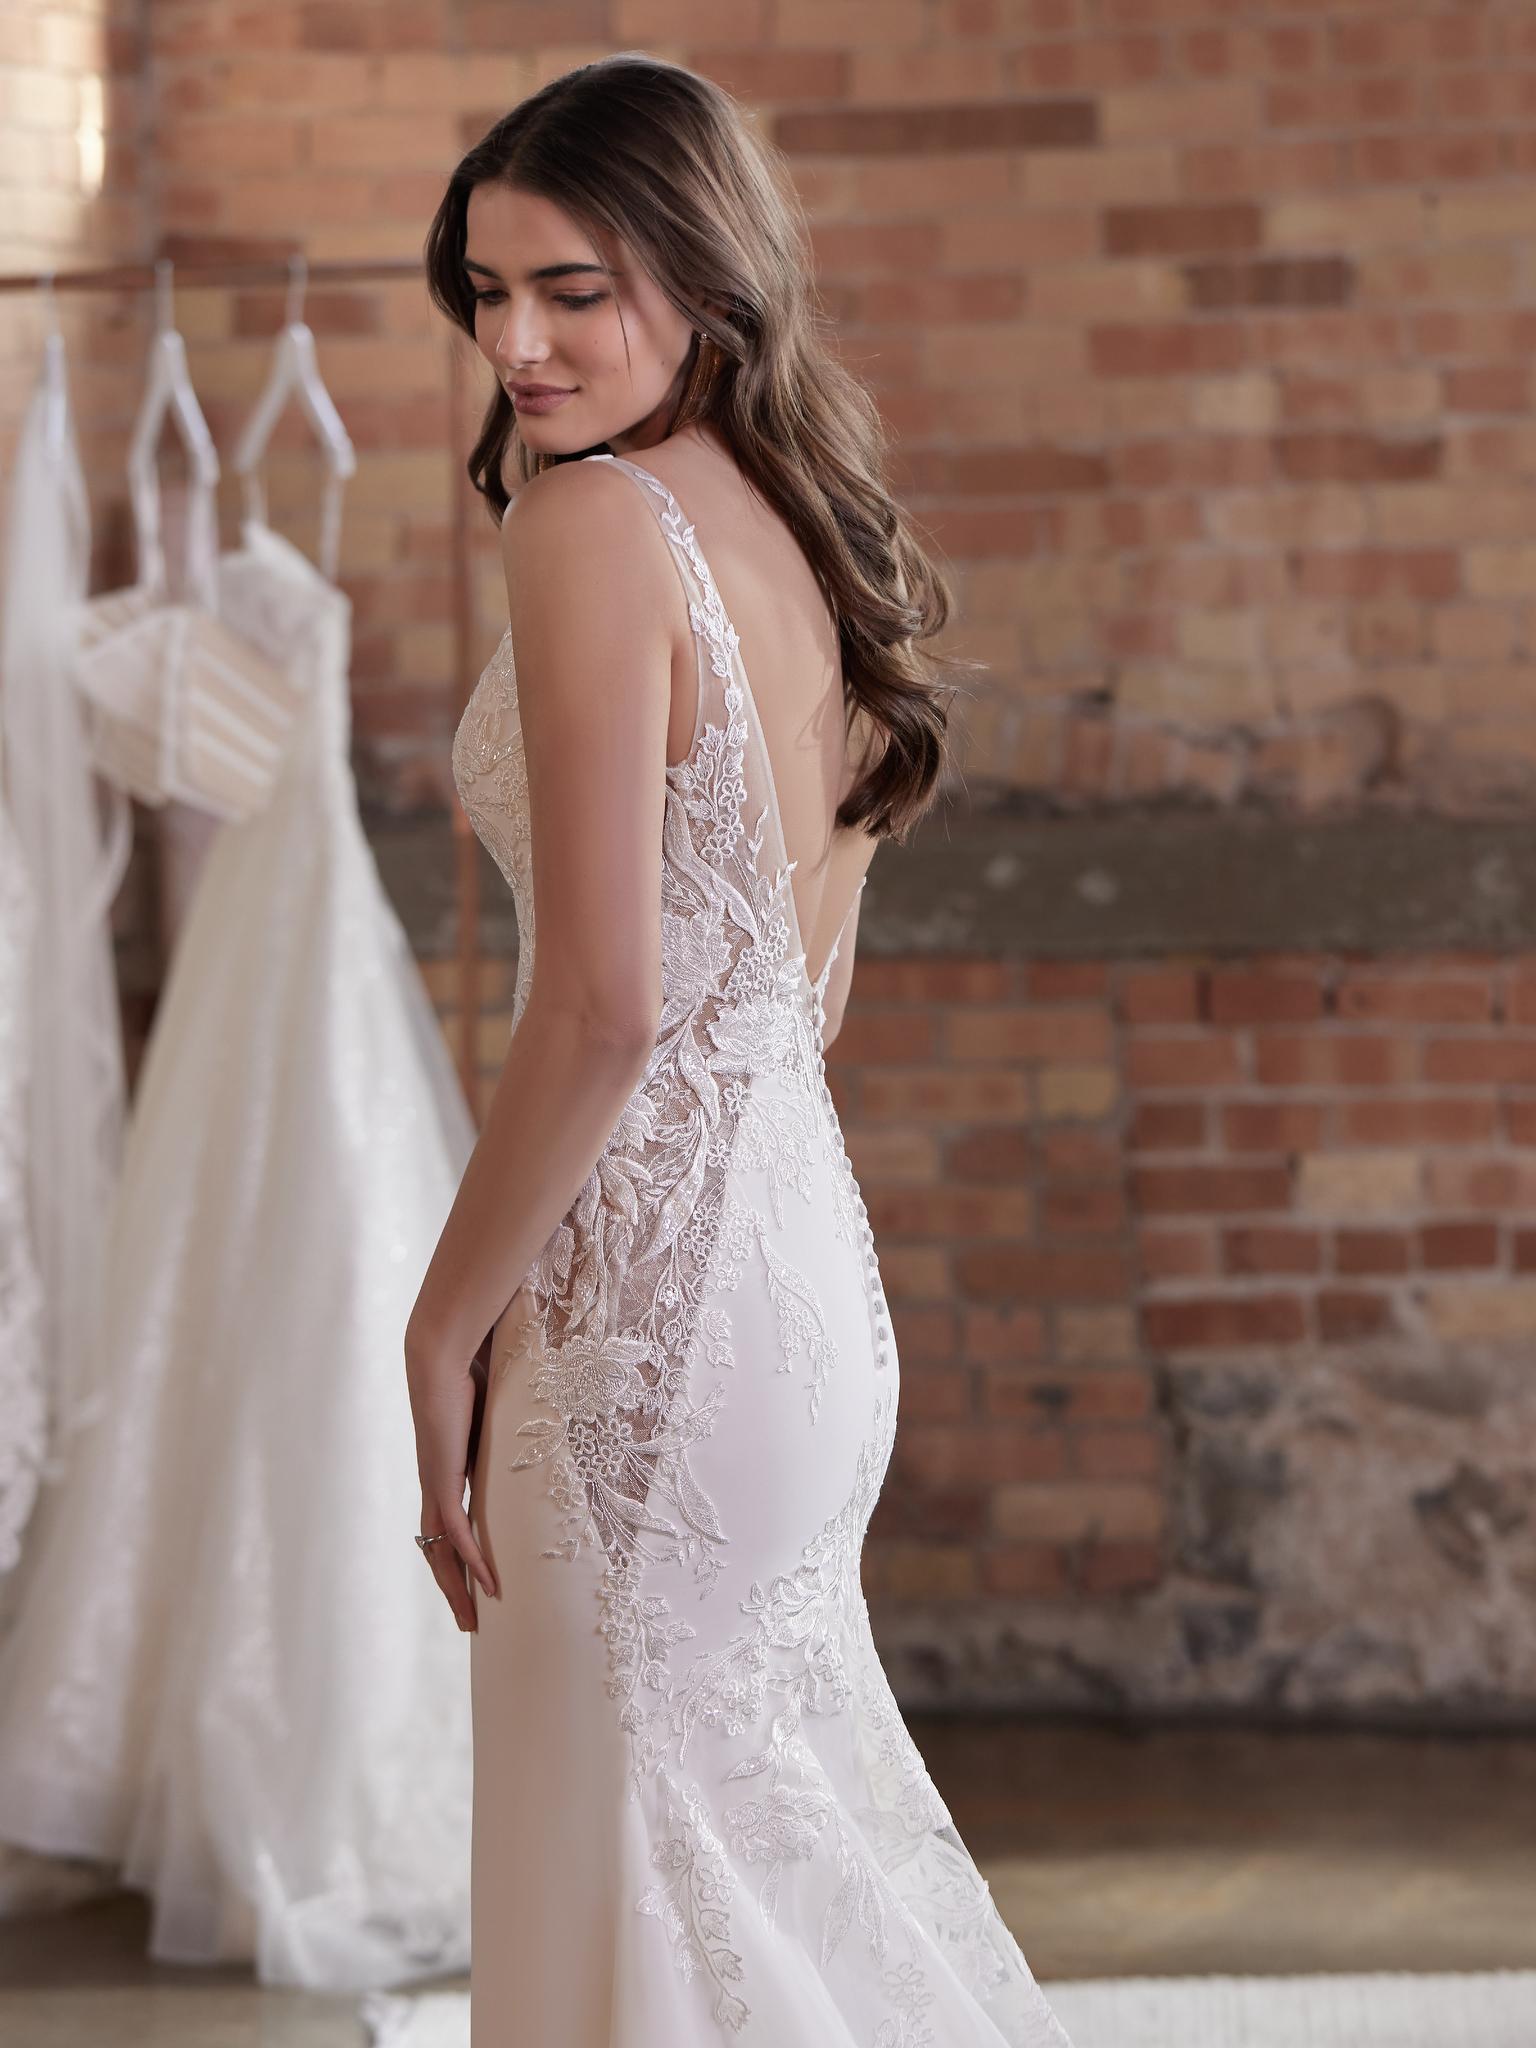 Maggie Sottero Bridal Spring 2022